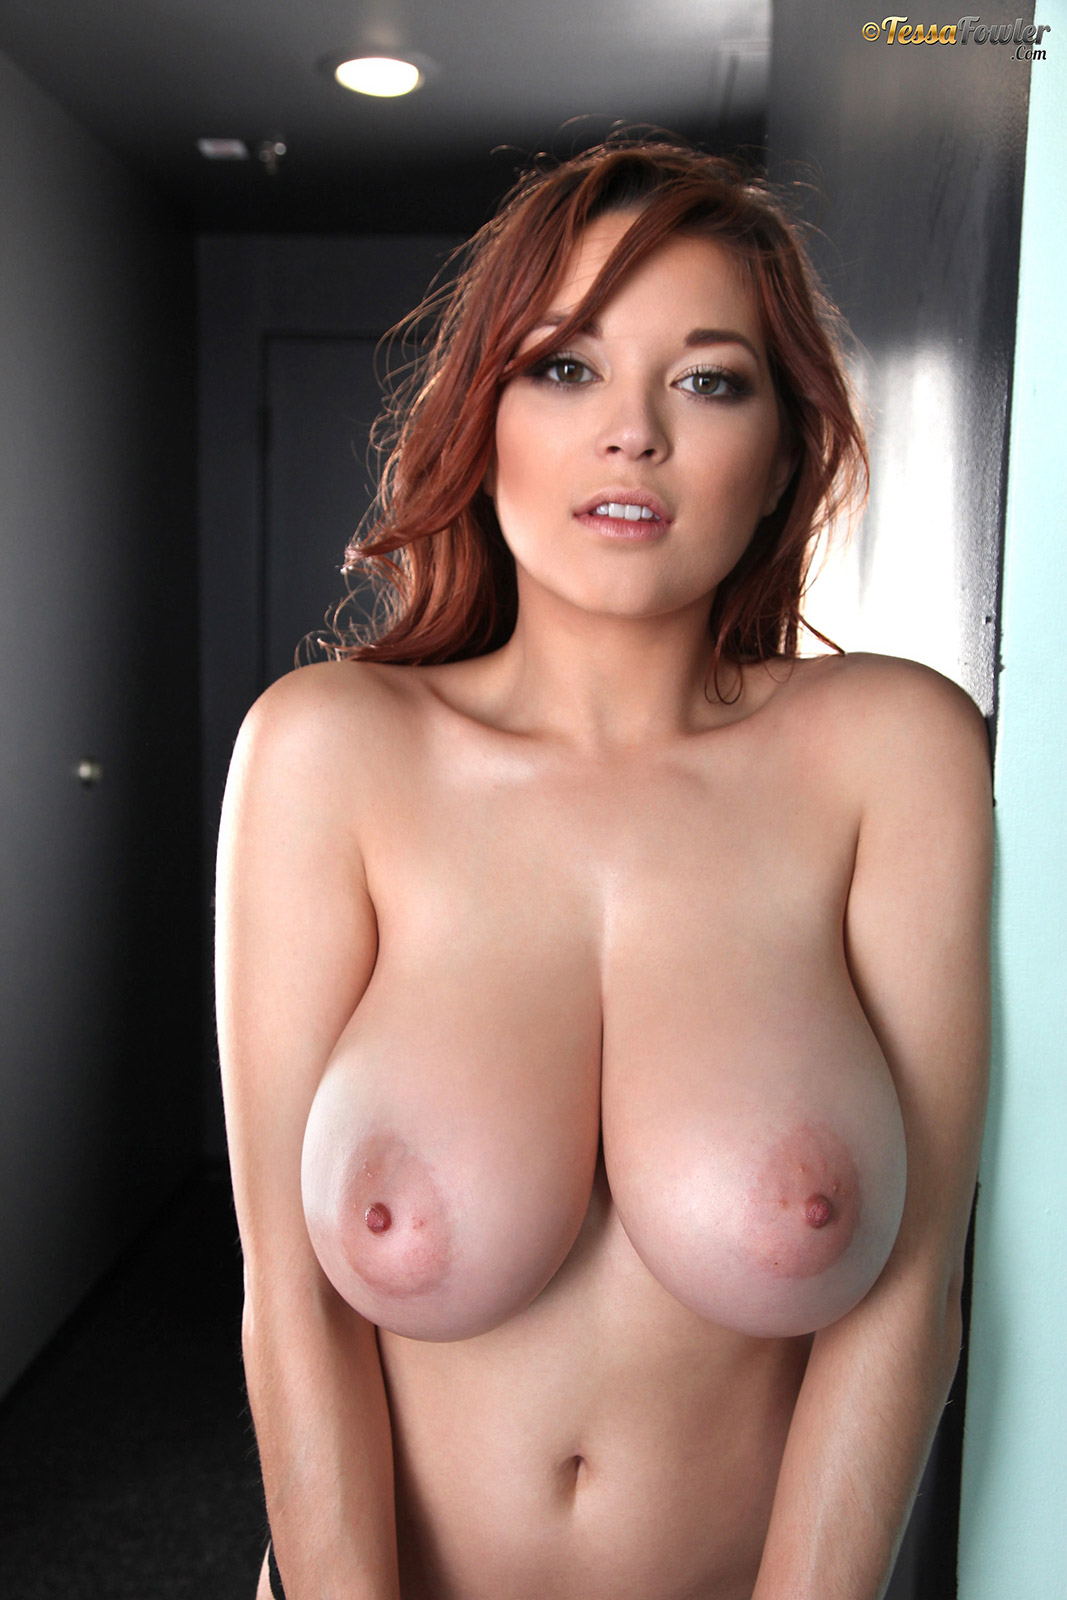 Tessa Fowler Pussy